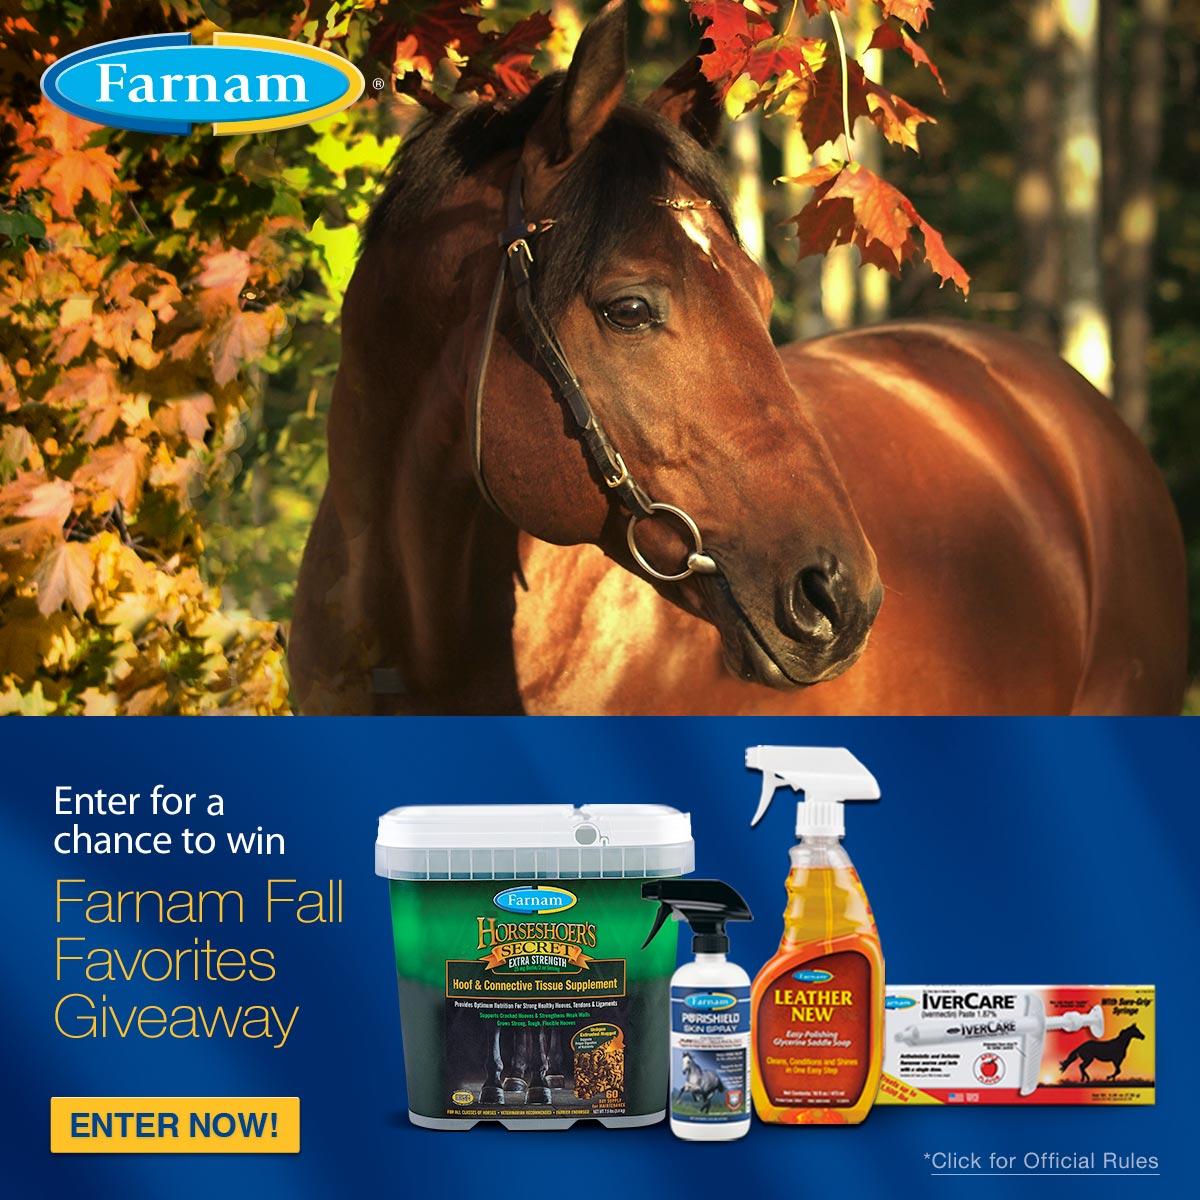 CGPF64503_Farnam_Sept_SM_Giveaway_1200x1200_D2.jpg